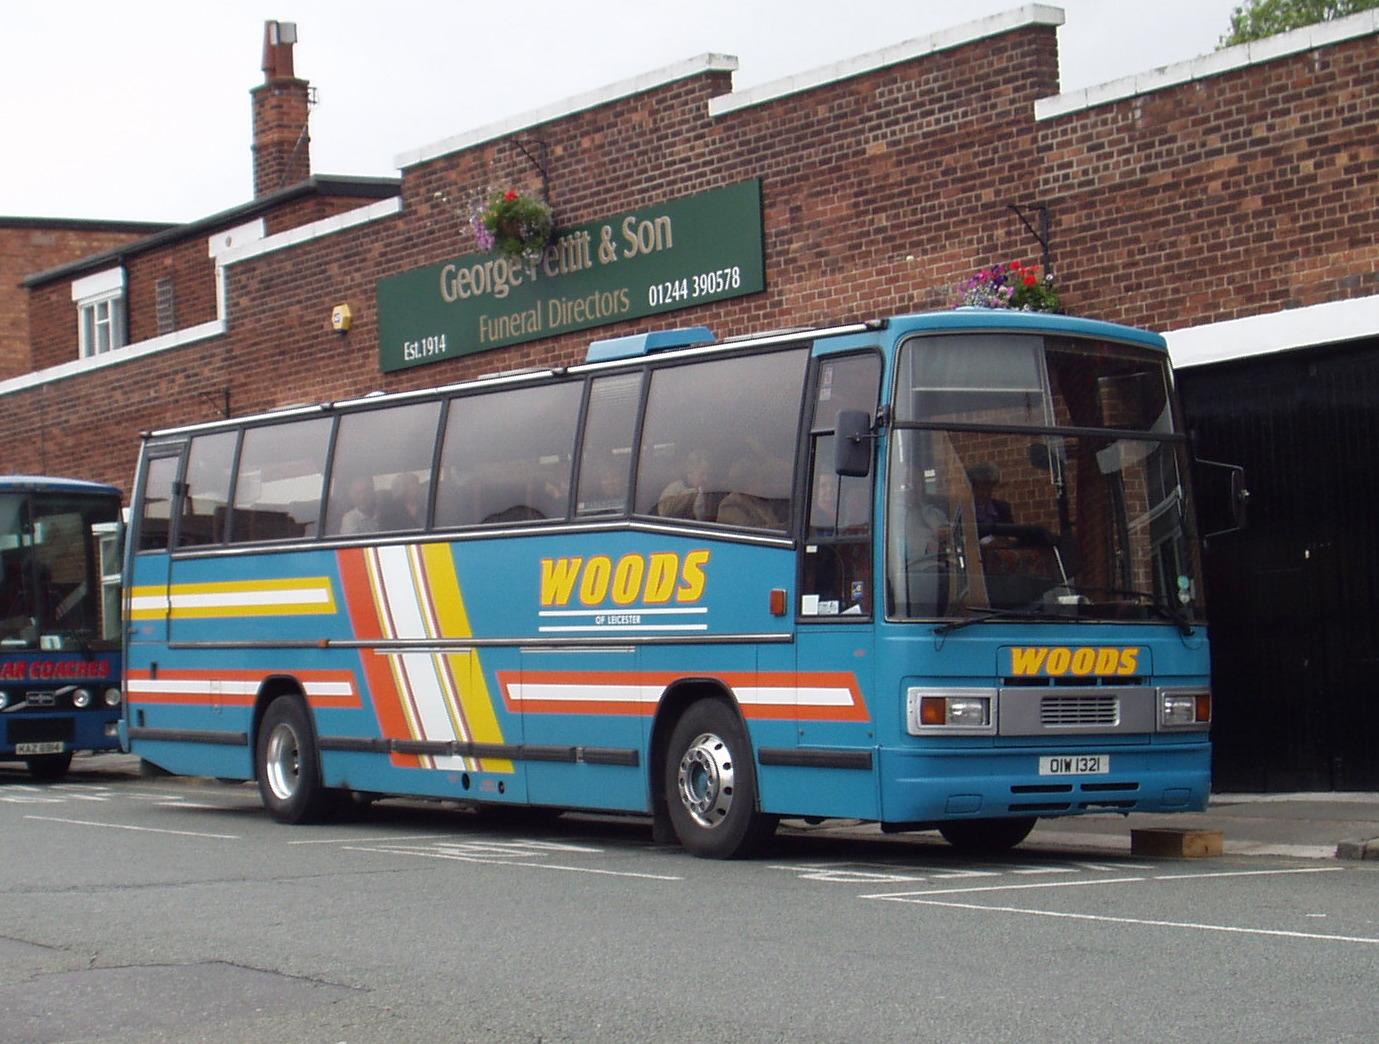 File:Plaxton Paramount II 3500 coach.jpg - Wikimedia Commons